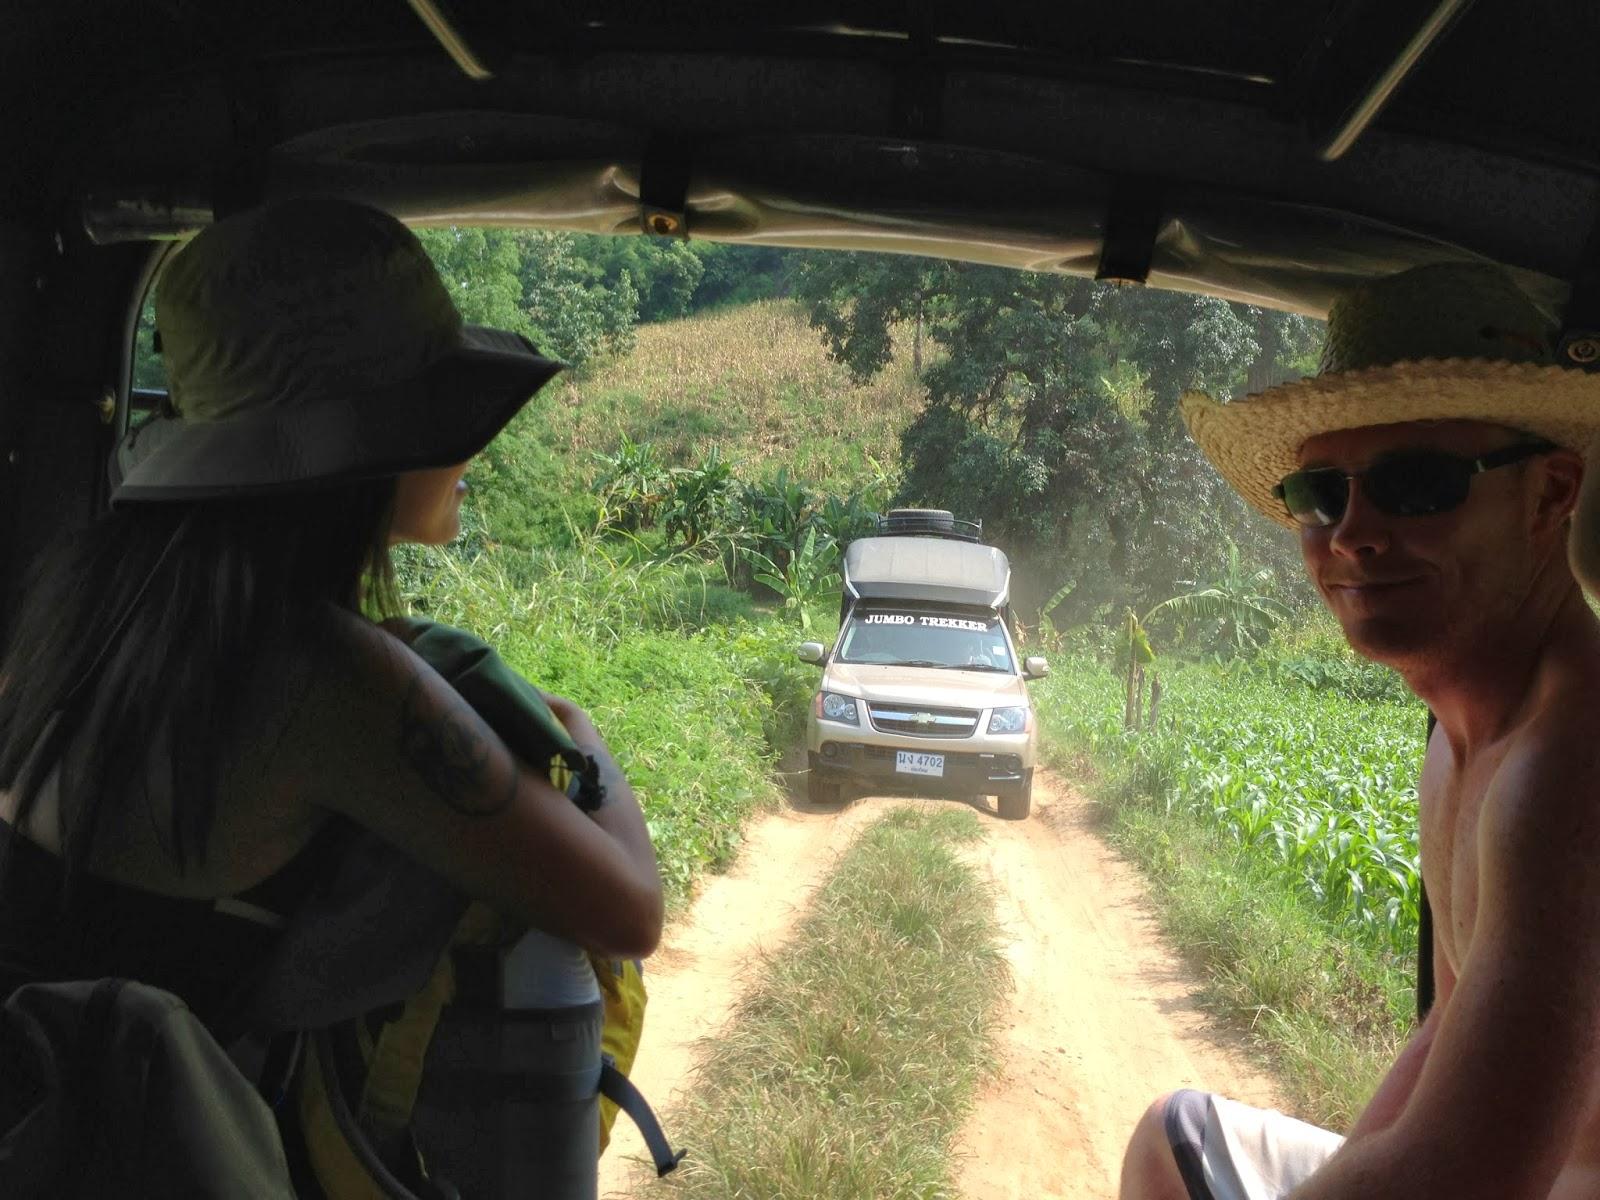 north-thailand-jungle-dirt-road-jumbo-trekker